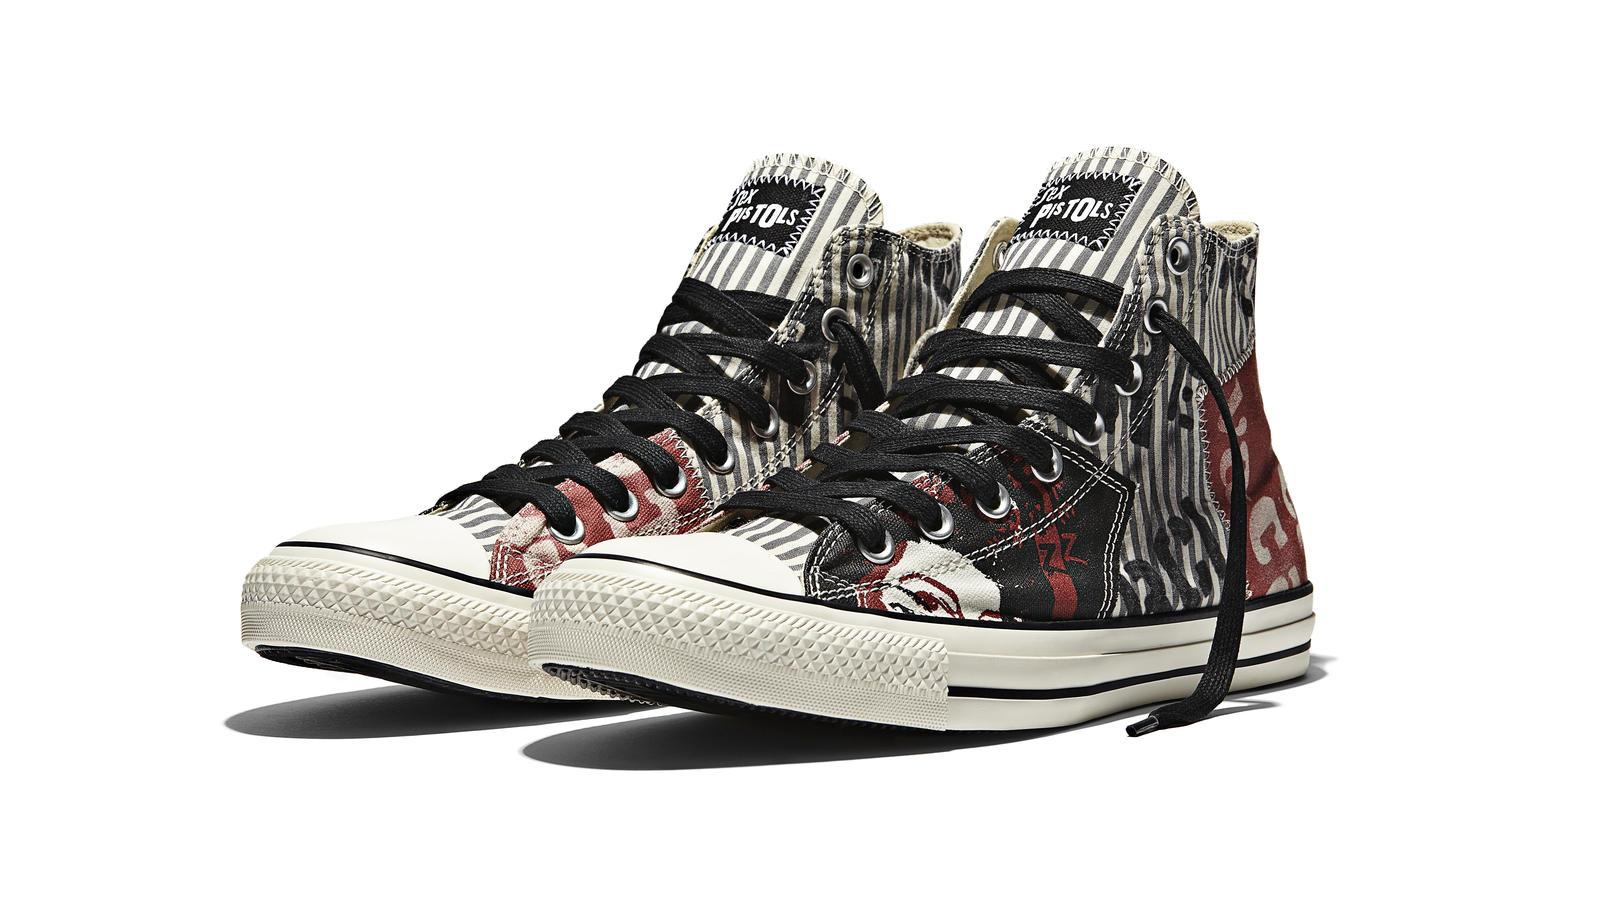 Sex in converse sneakers